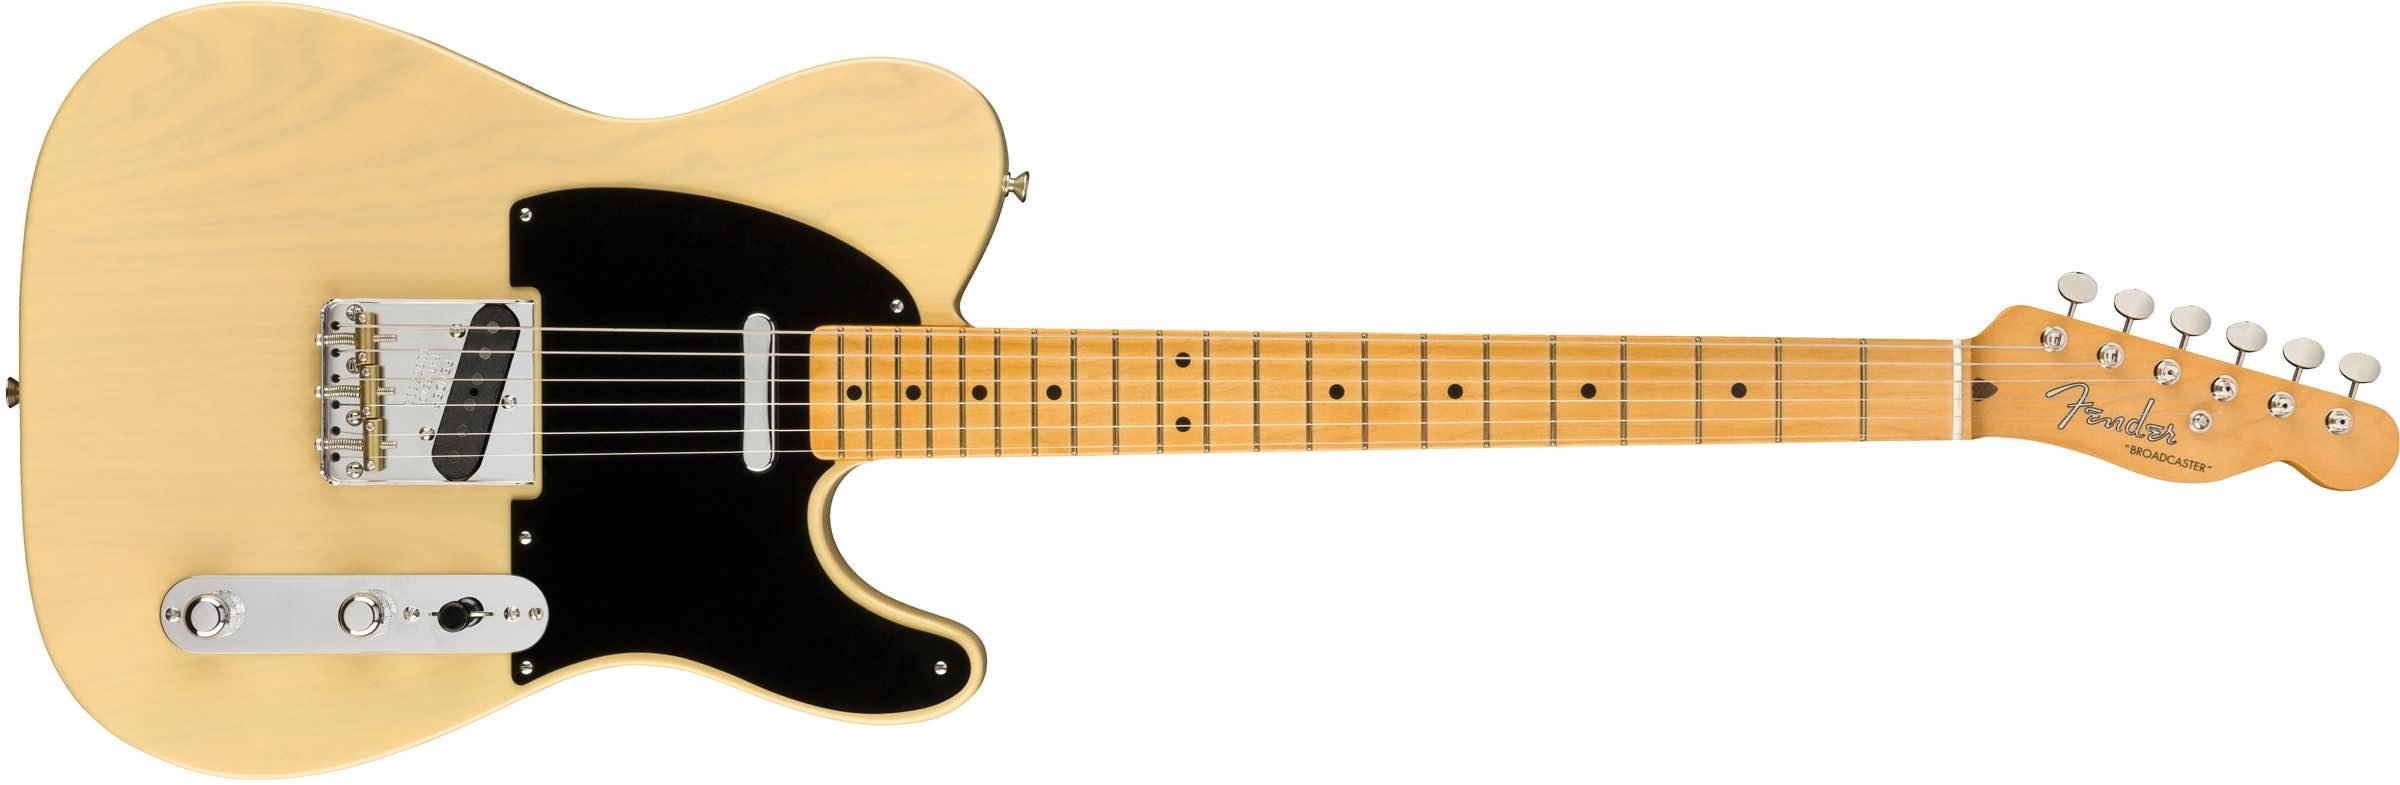 Fender 70th Anniversary Broadcaster chitarra guitar electric elettrica telecaster strumenti musicali